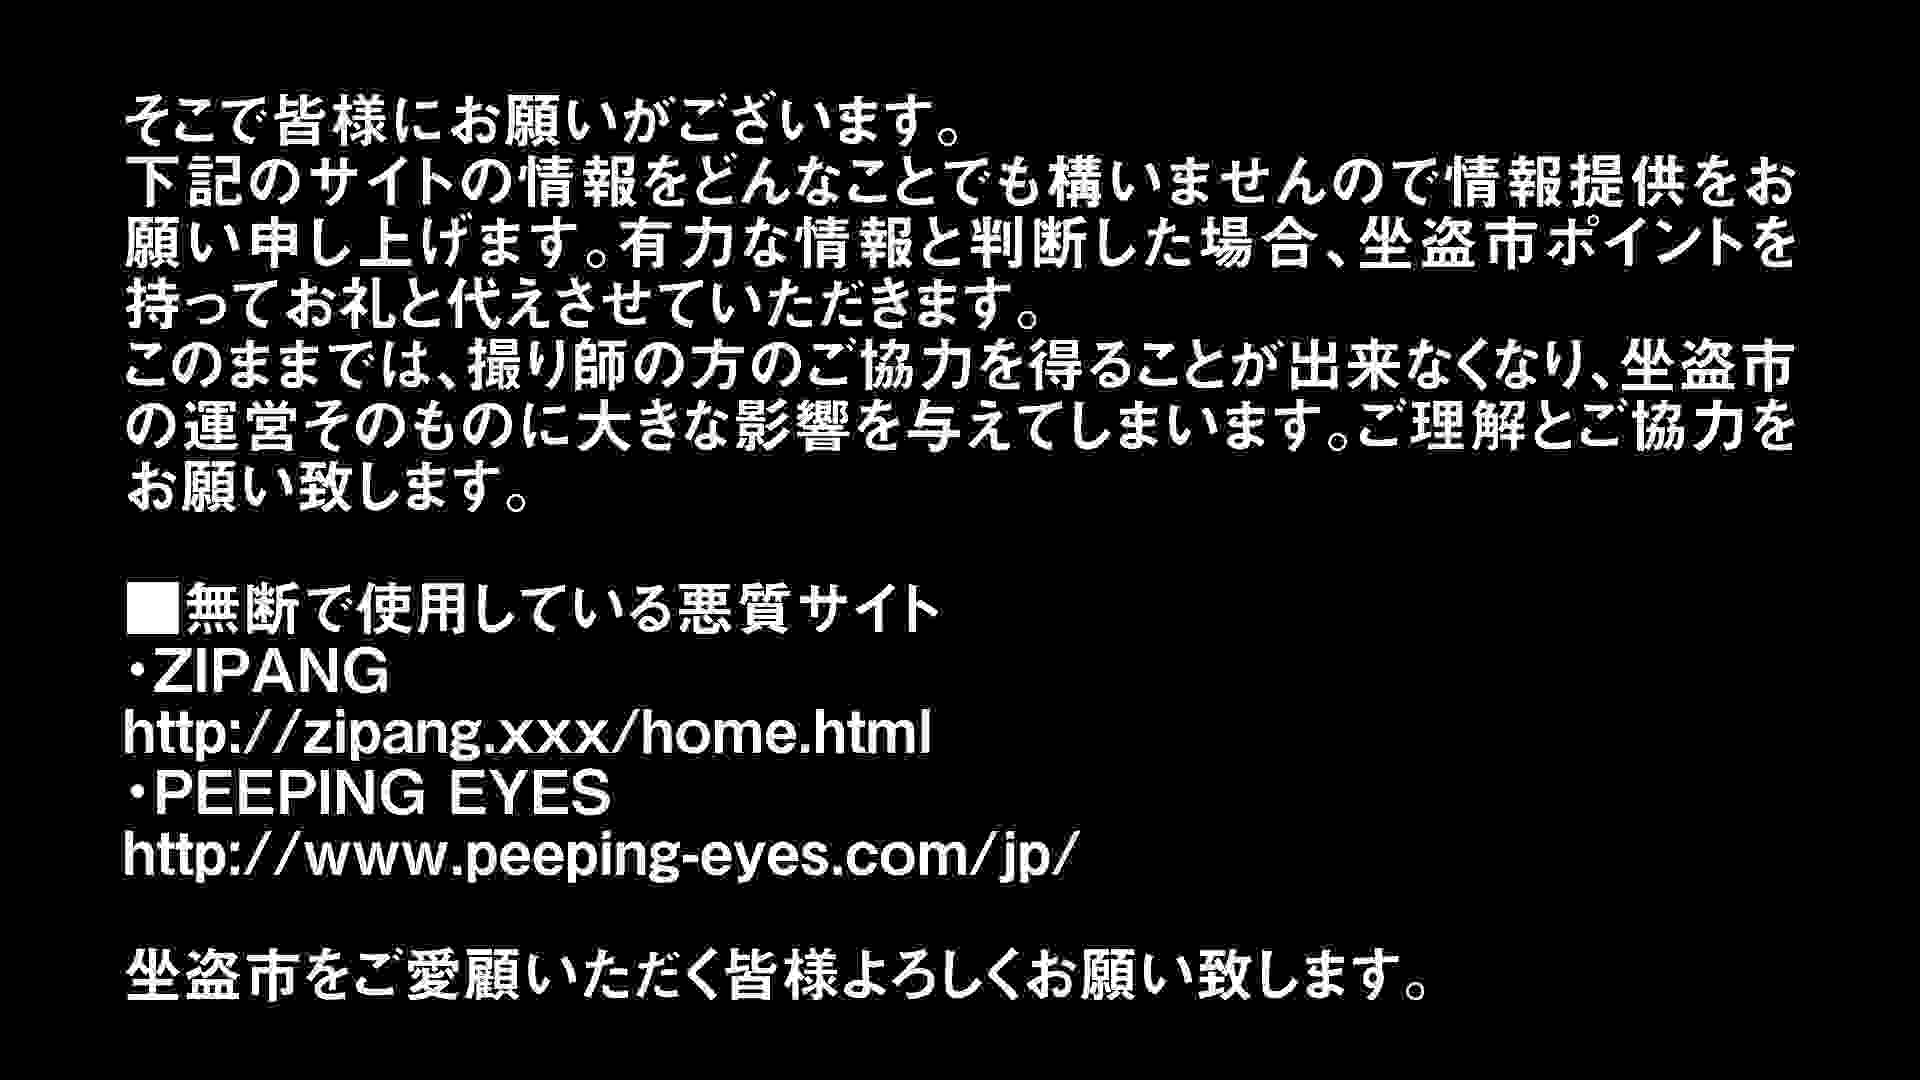 Aquaな露天風呂Vol.296 盗撮 | OLセックス  91画像 37